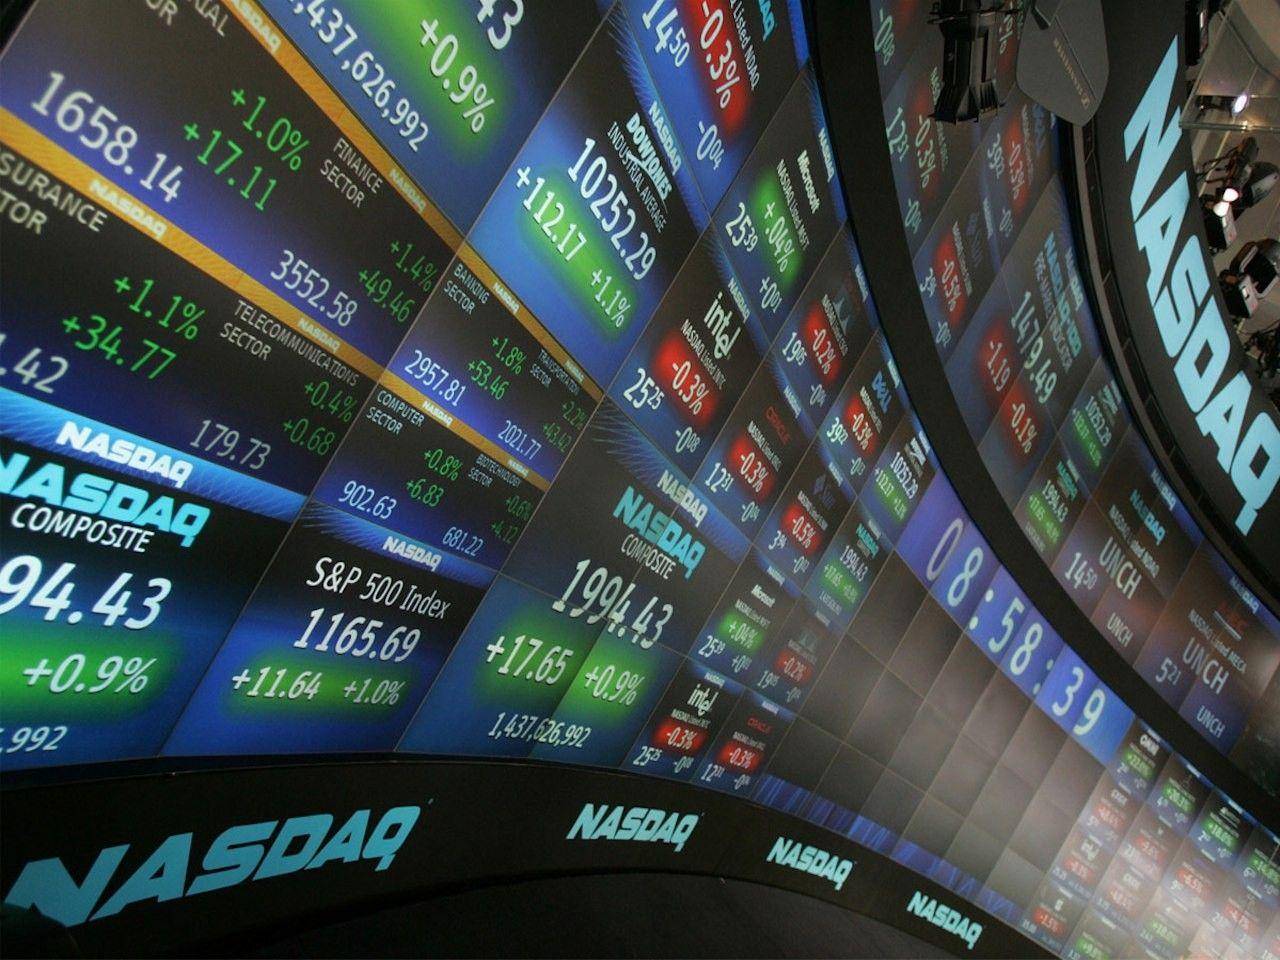 Reality Shares: Nasdaq Partner  Wants To Launch Blockchain Economic index